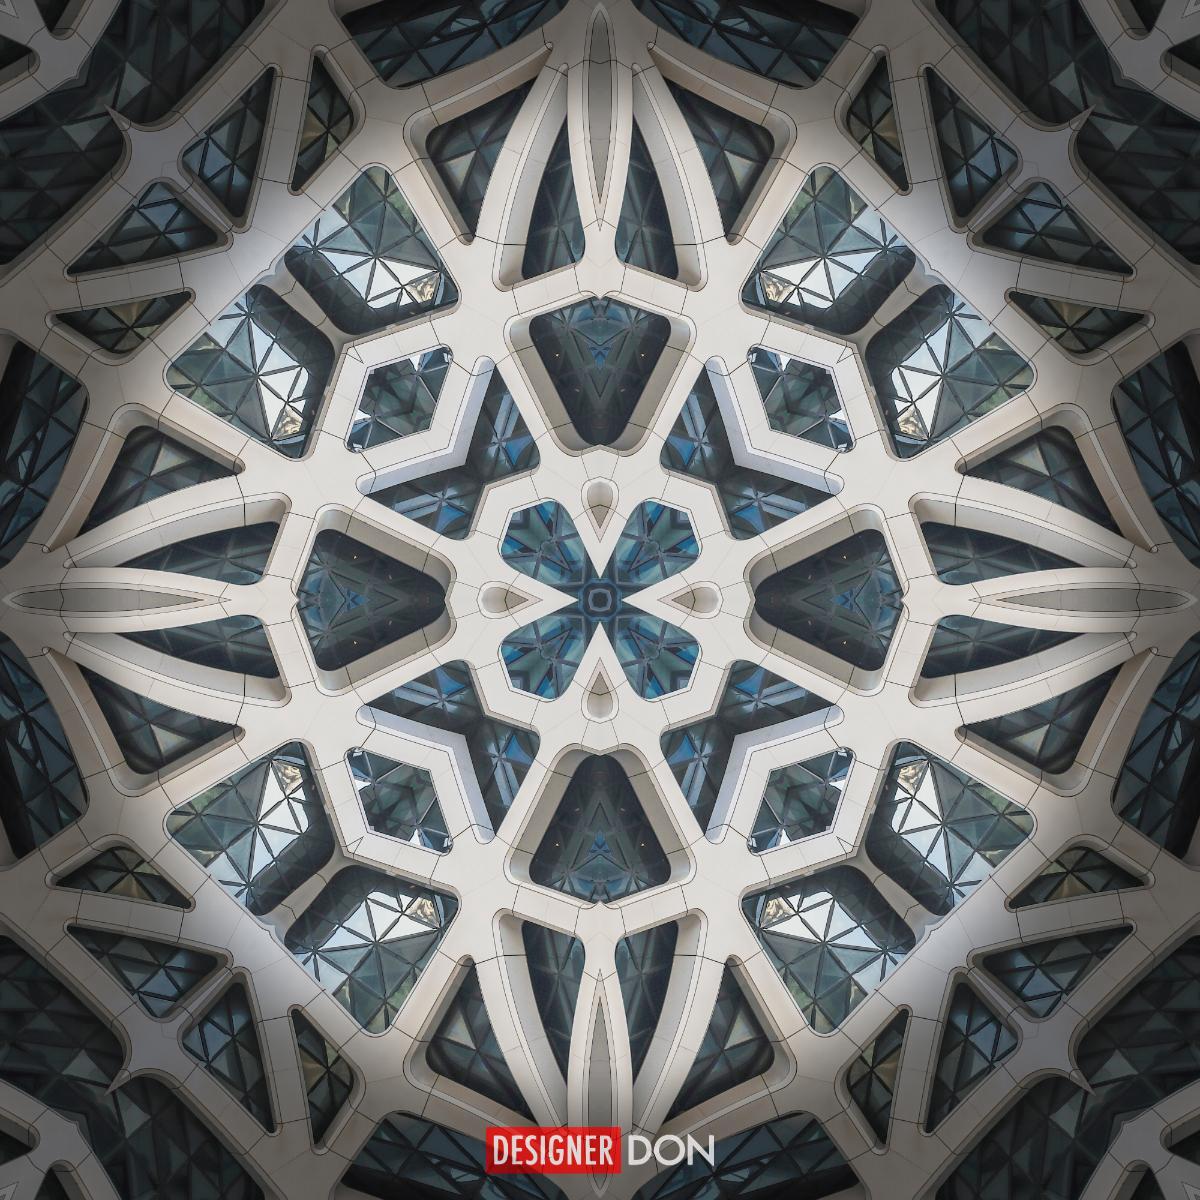 Cathedra: Stone, Glass, Geometric Art Series